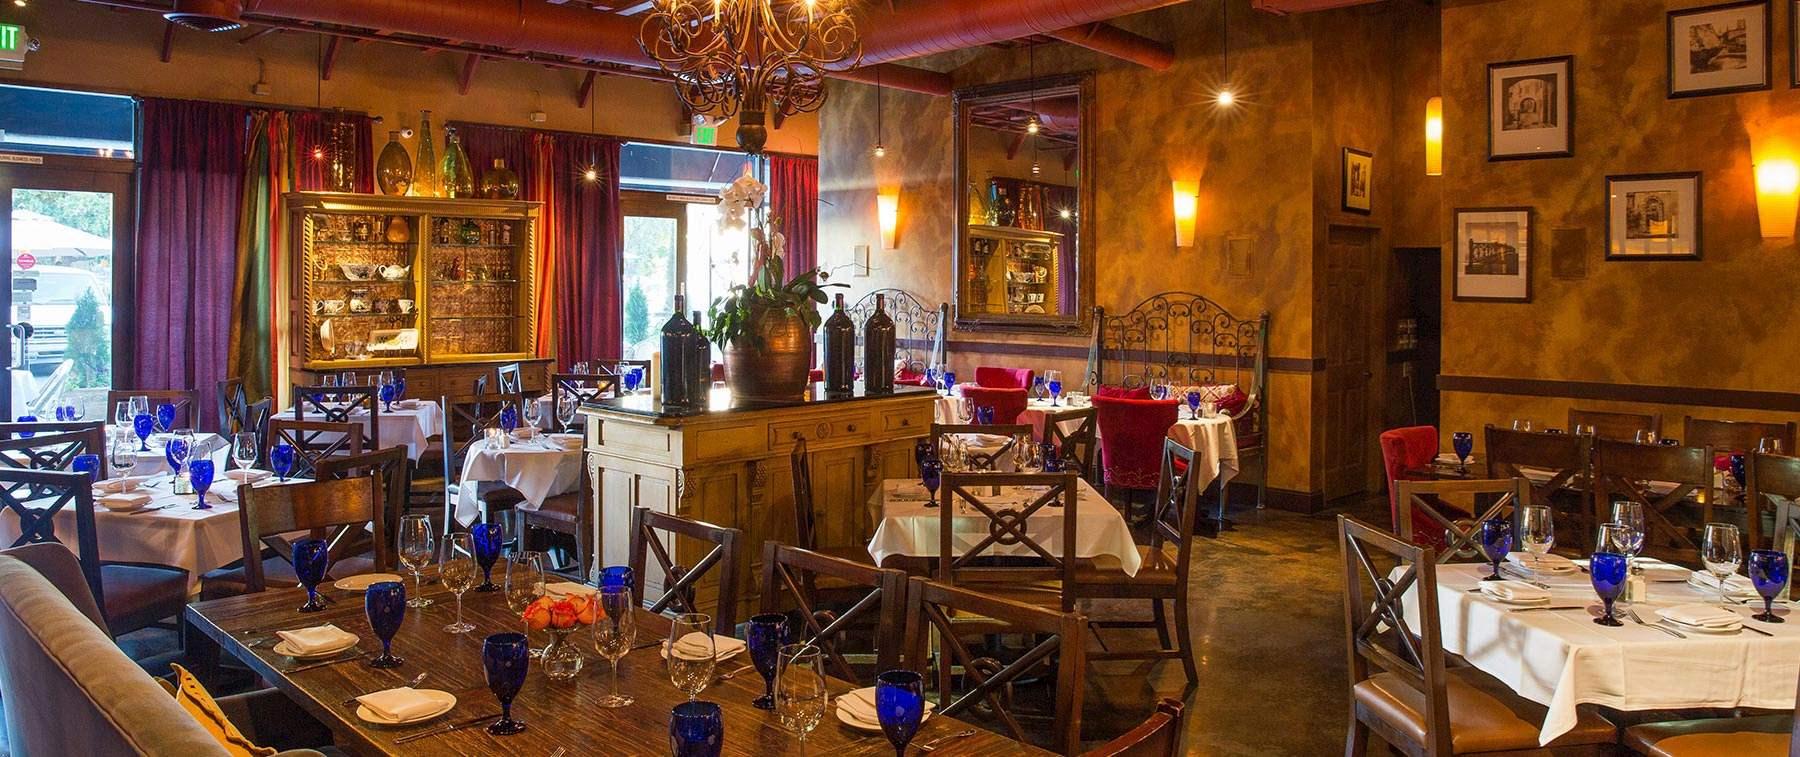 Cucina Venti Restaurant at Mountain View